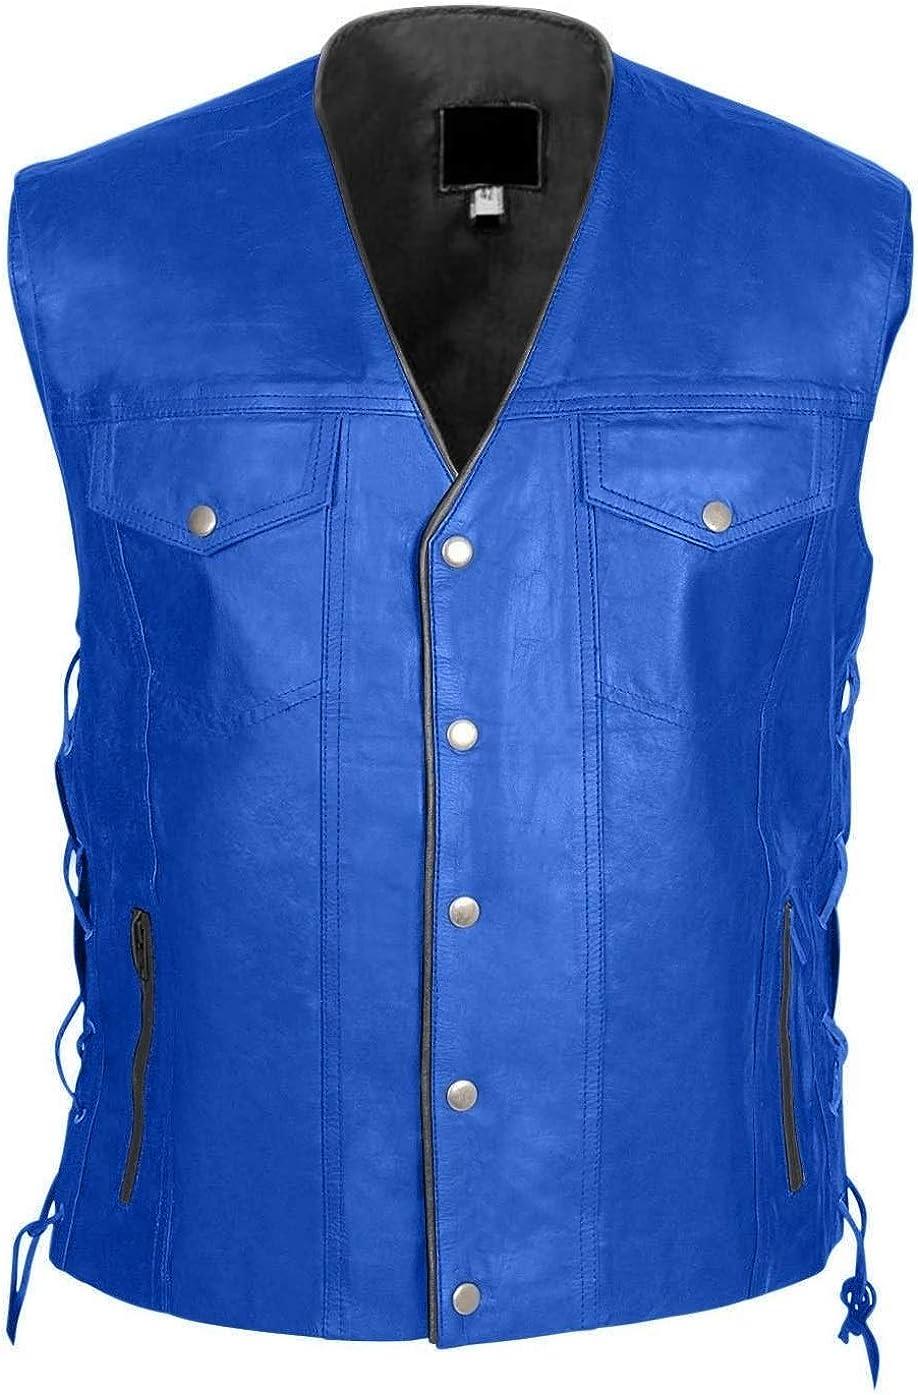 Men's Genuine Cowhide Blue Leather Vest